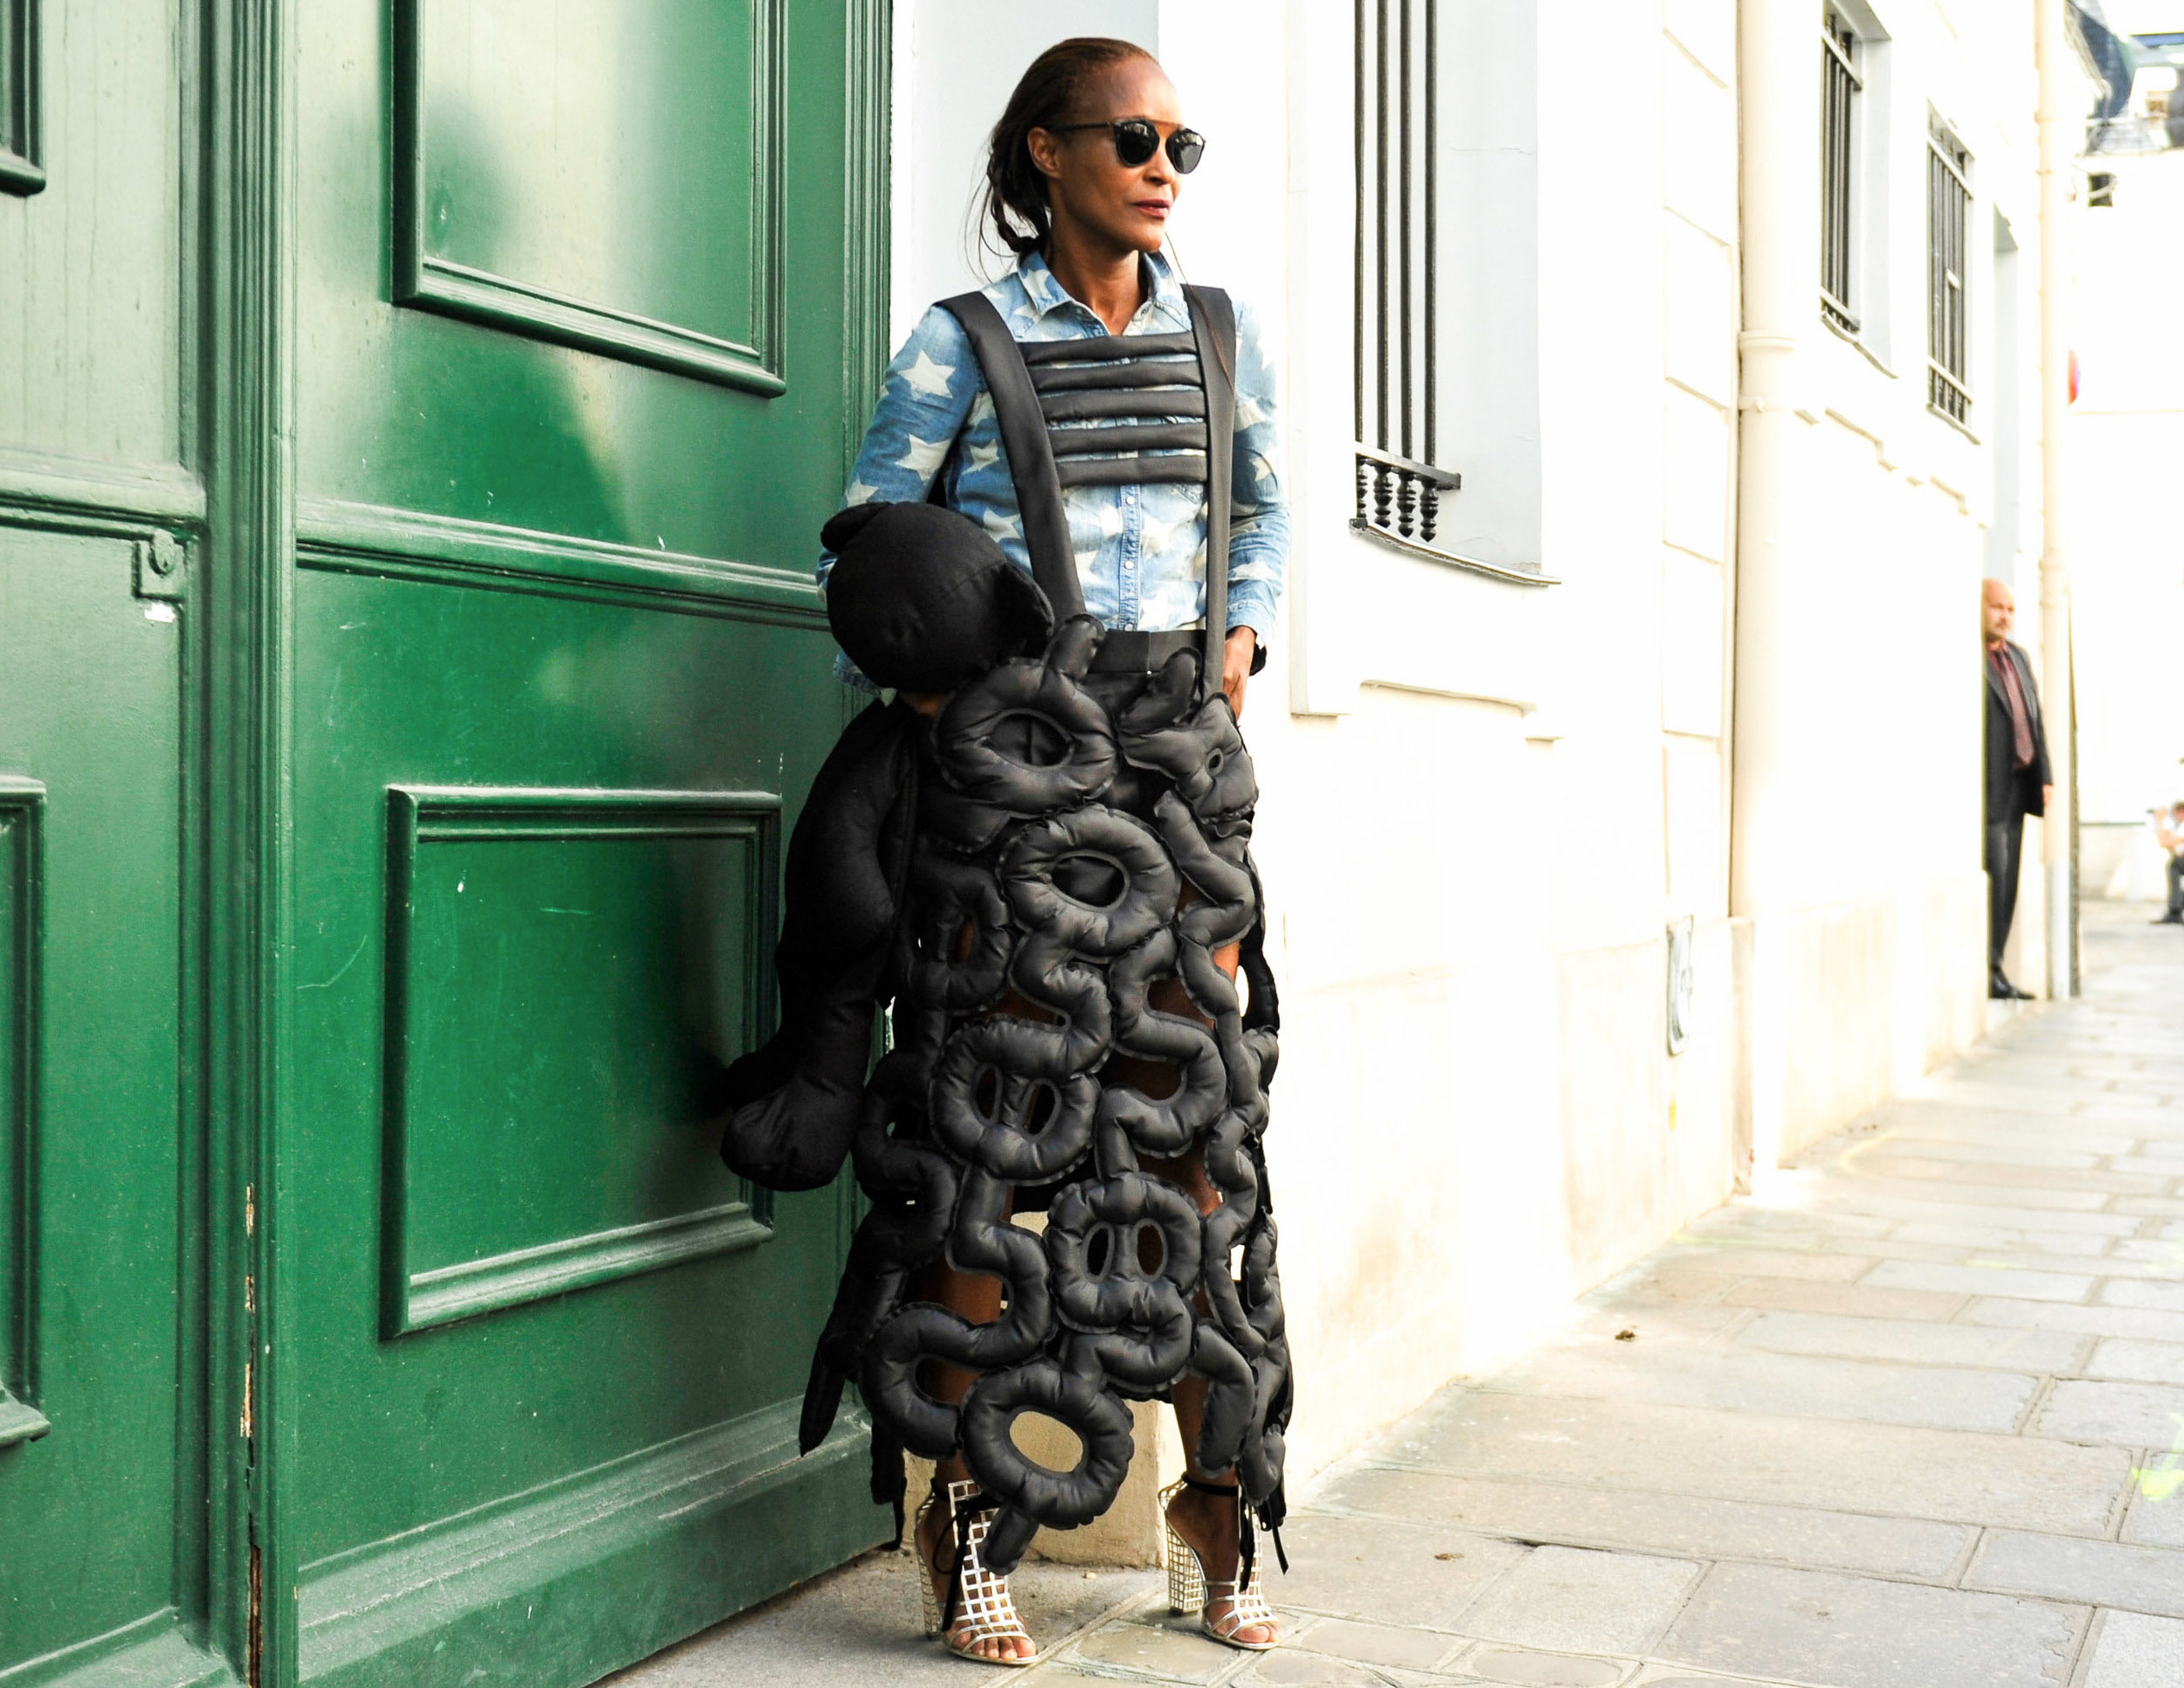 StreetStyle_ParisFashionWeek_LeandroJusten_115.jpg